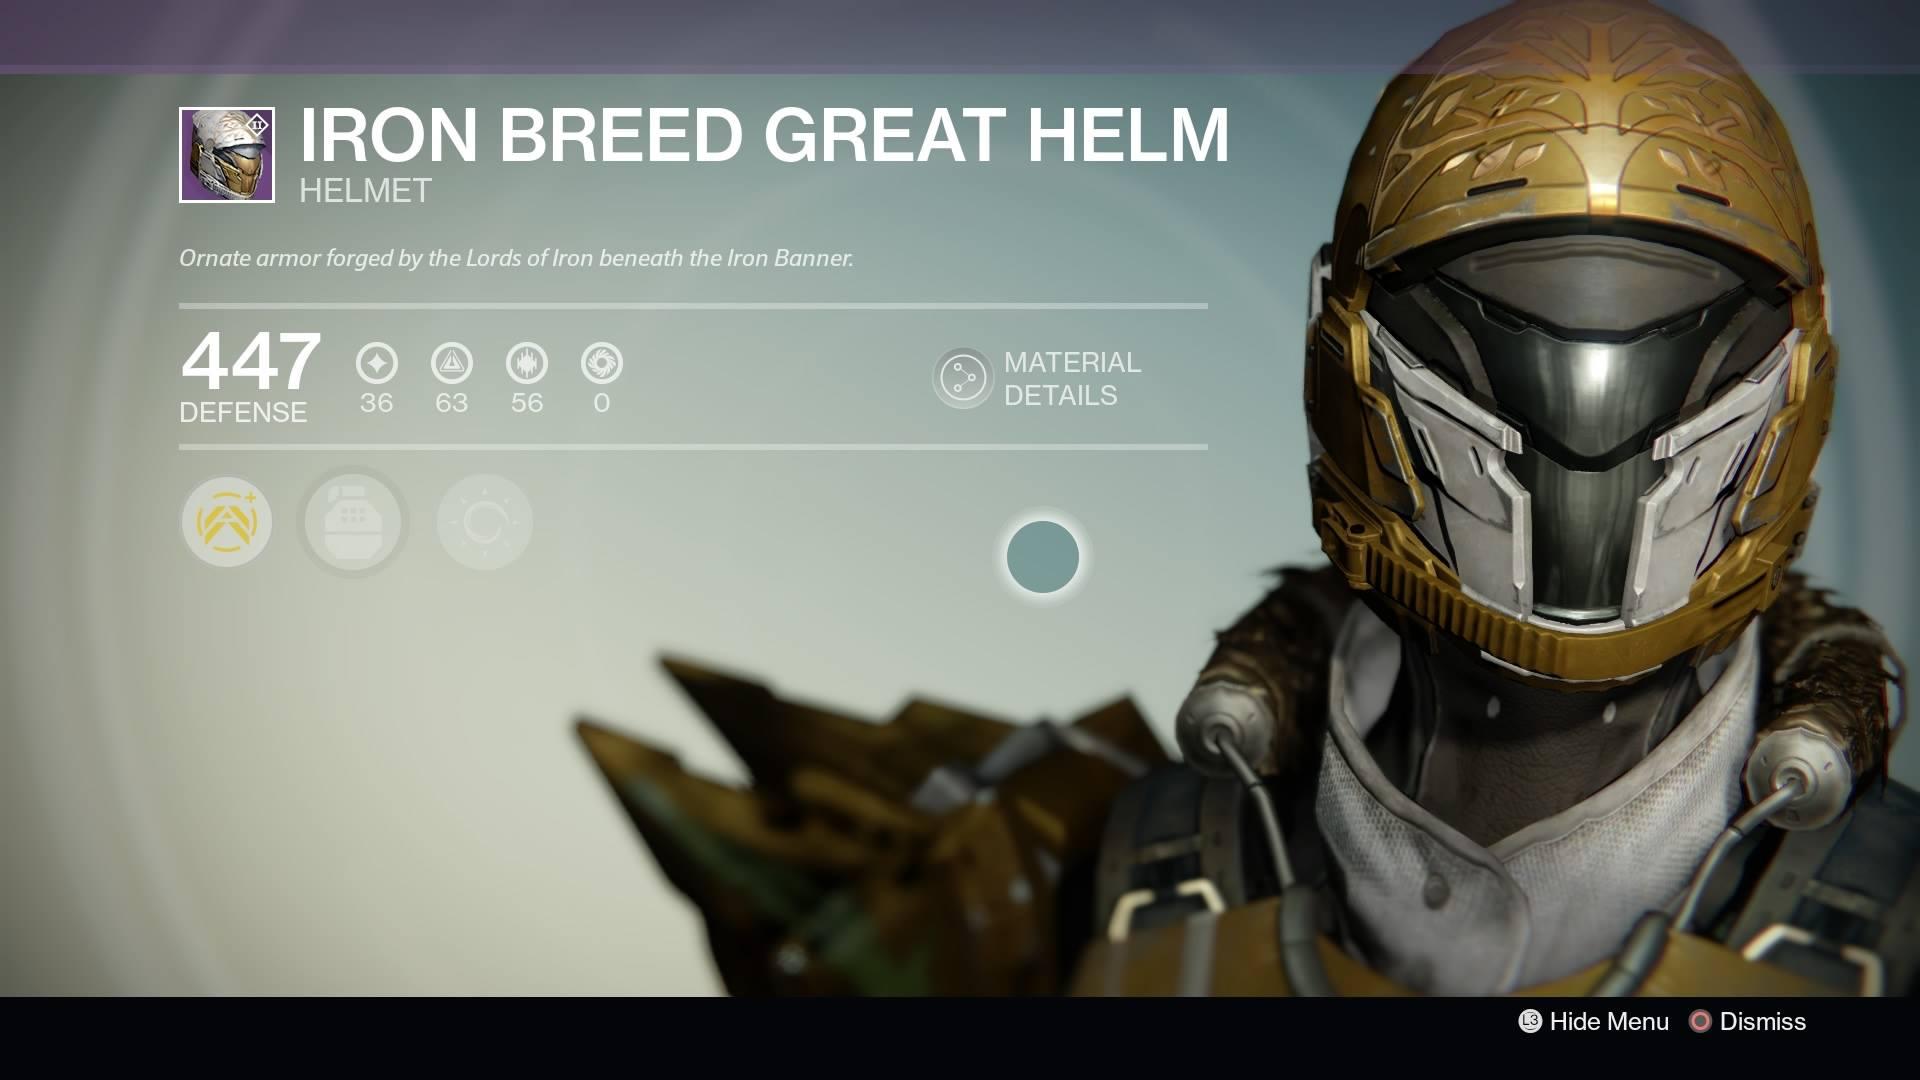 Destiny - Titan Iron Breed Great Helm